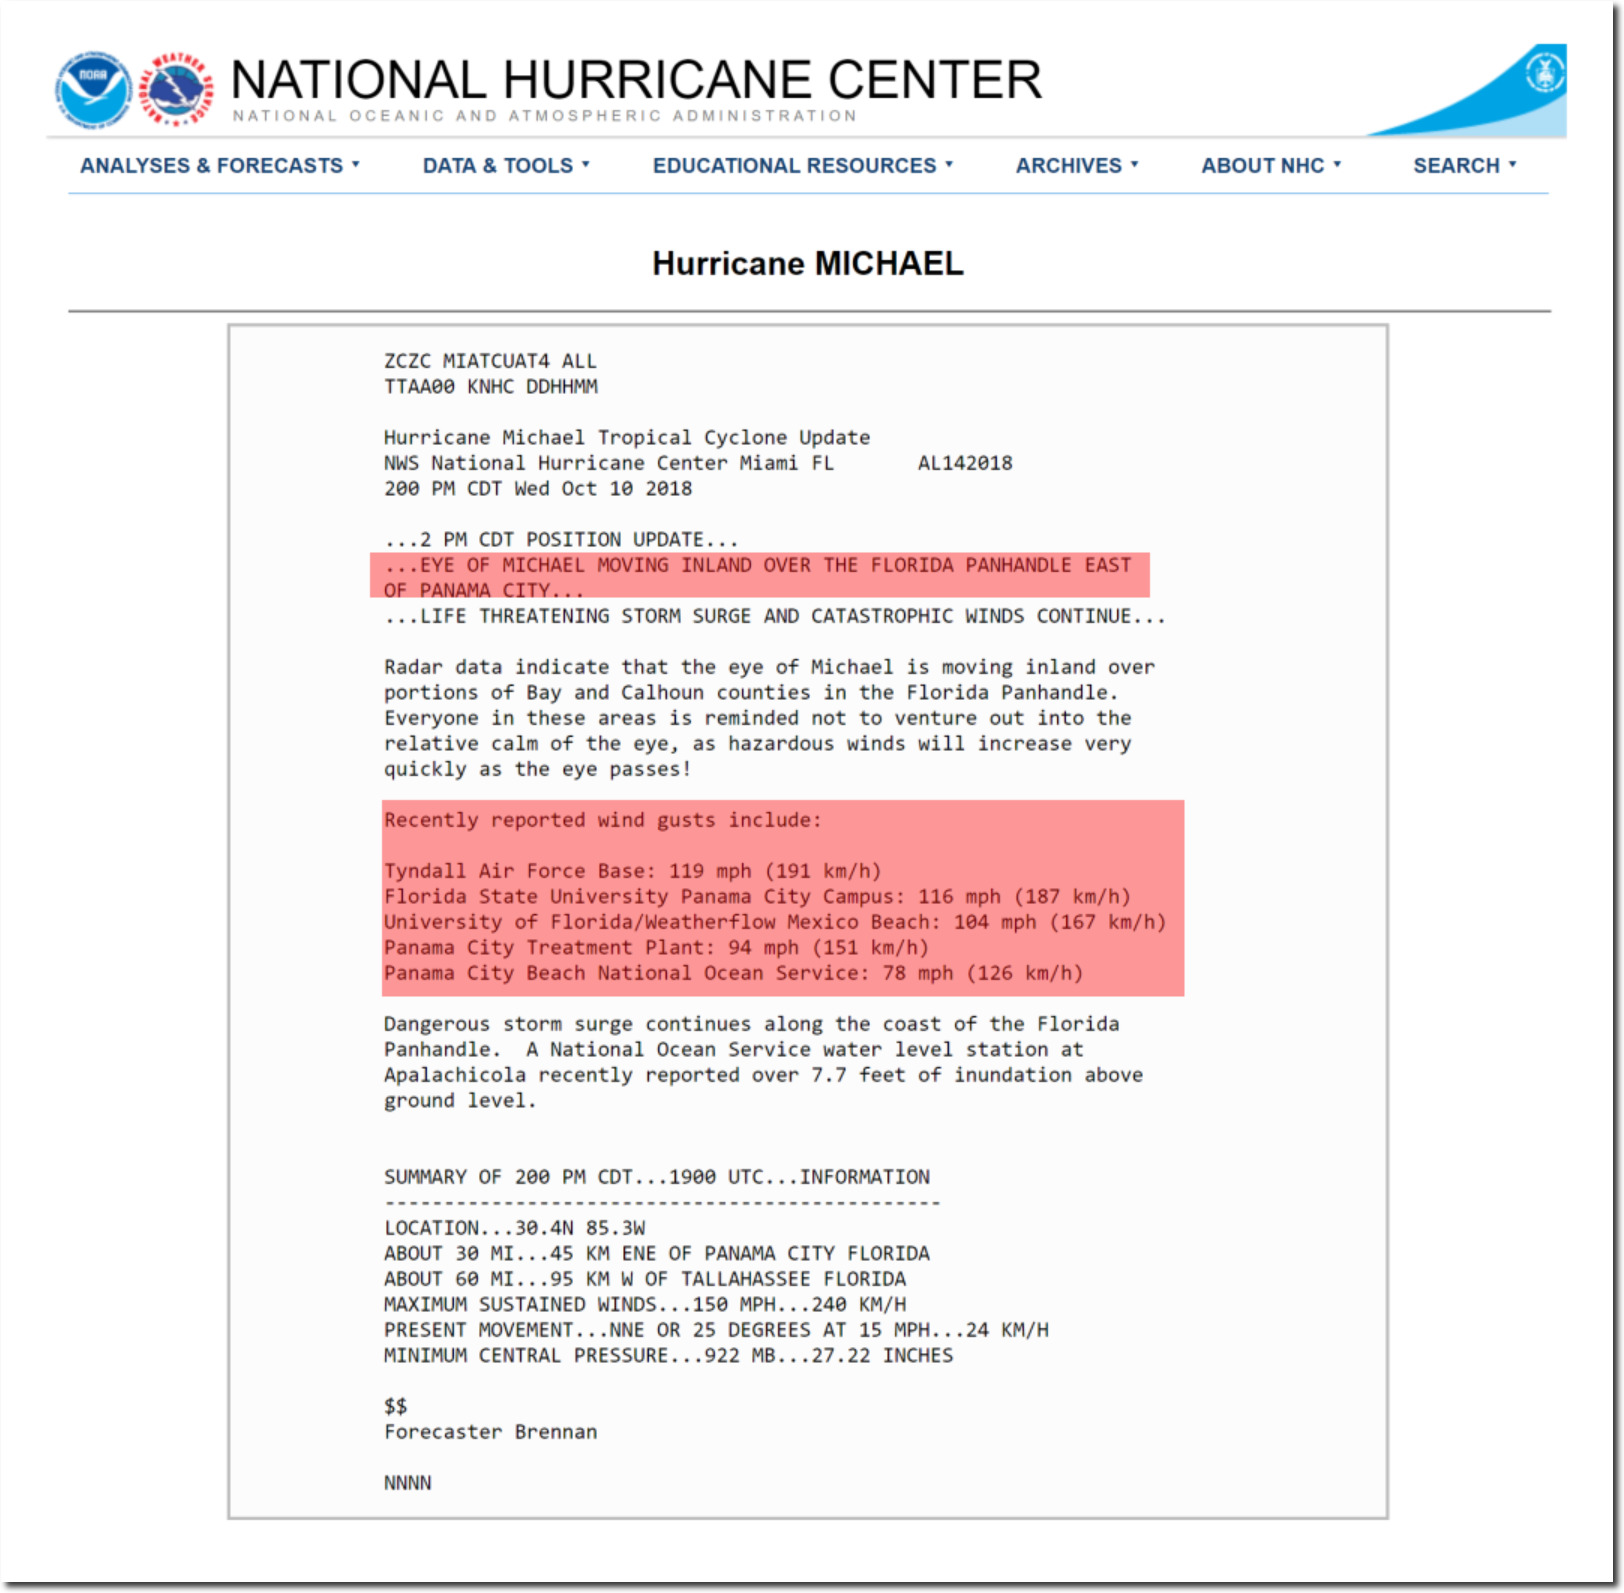 Hurricane Category 2 Wind Speed